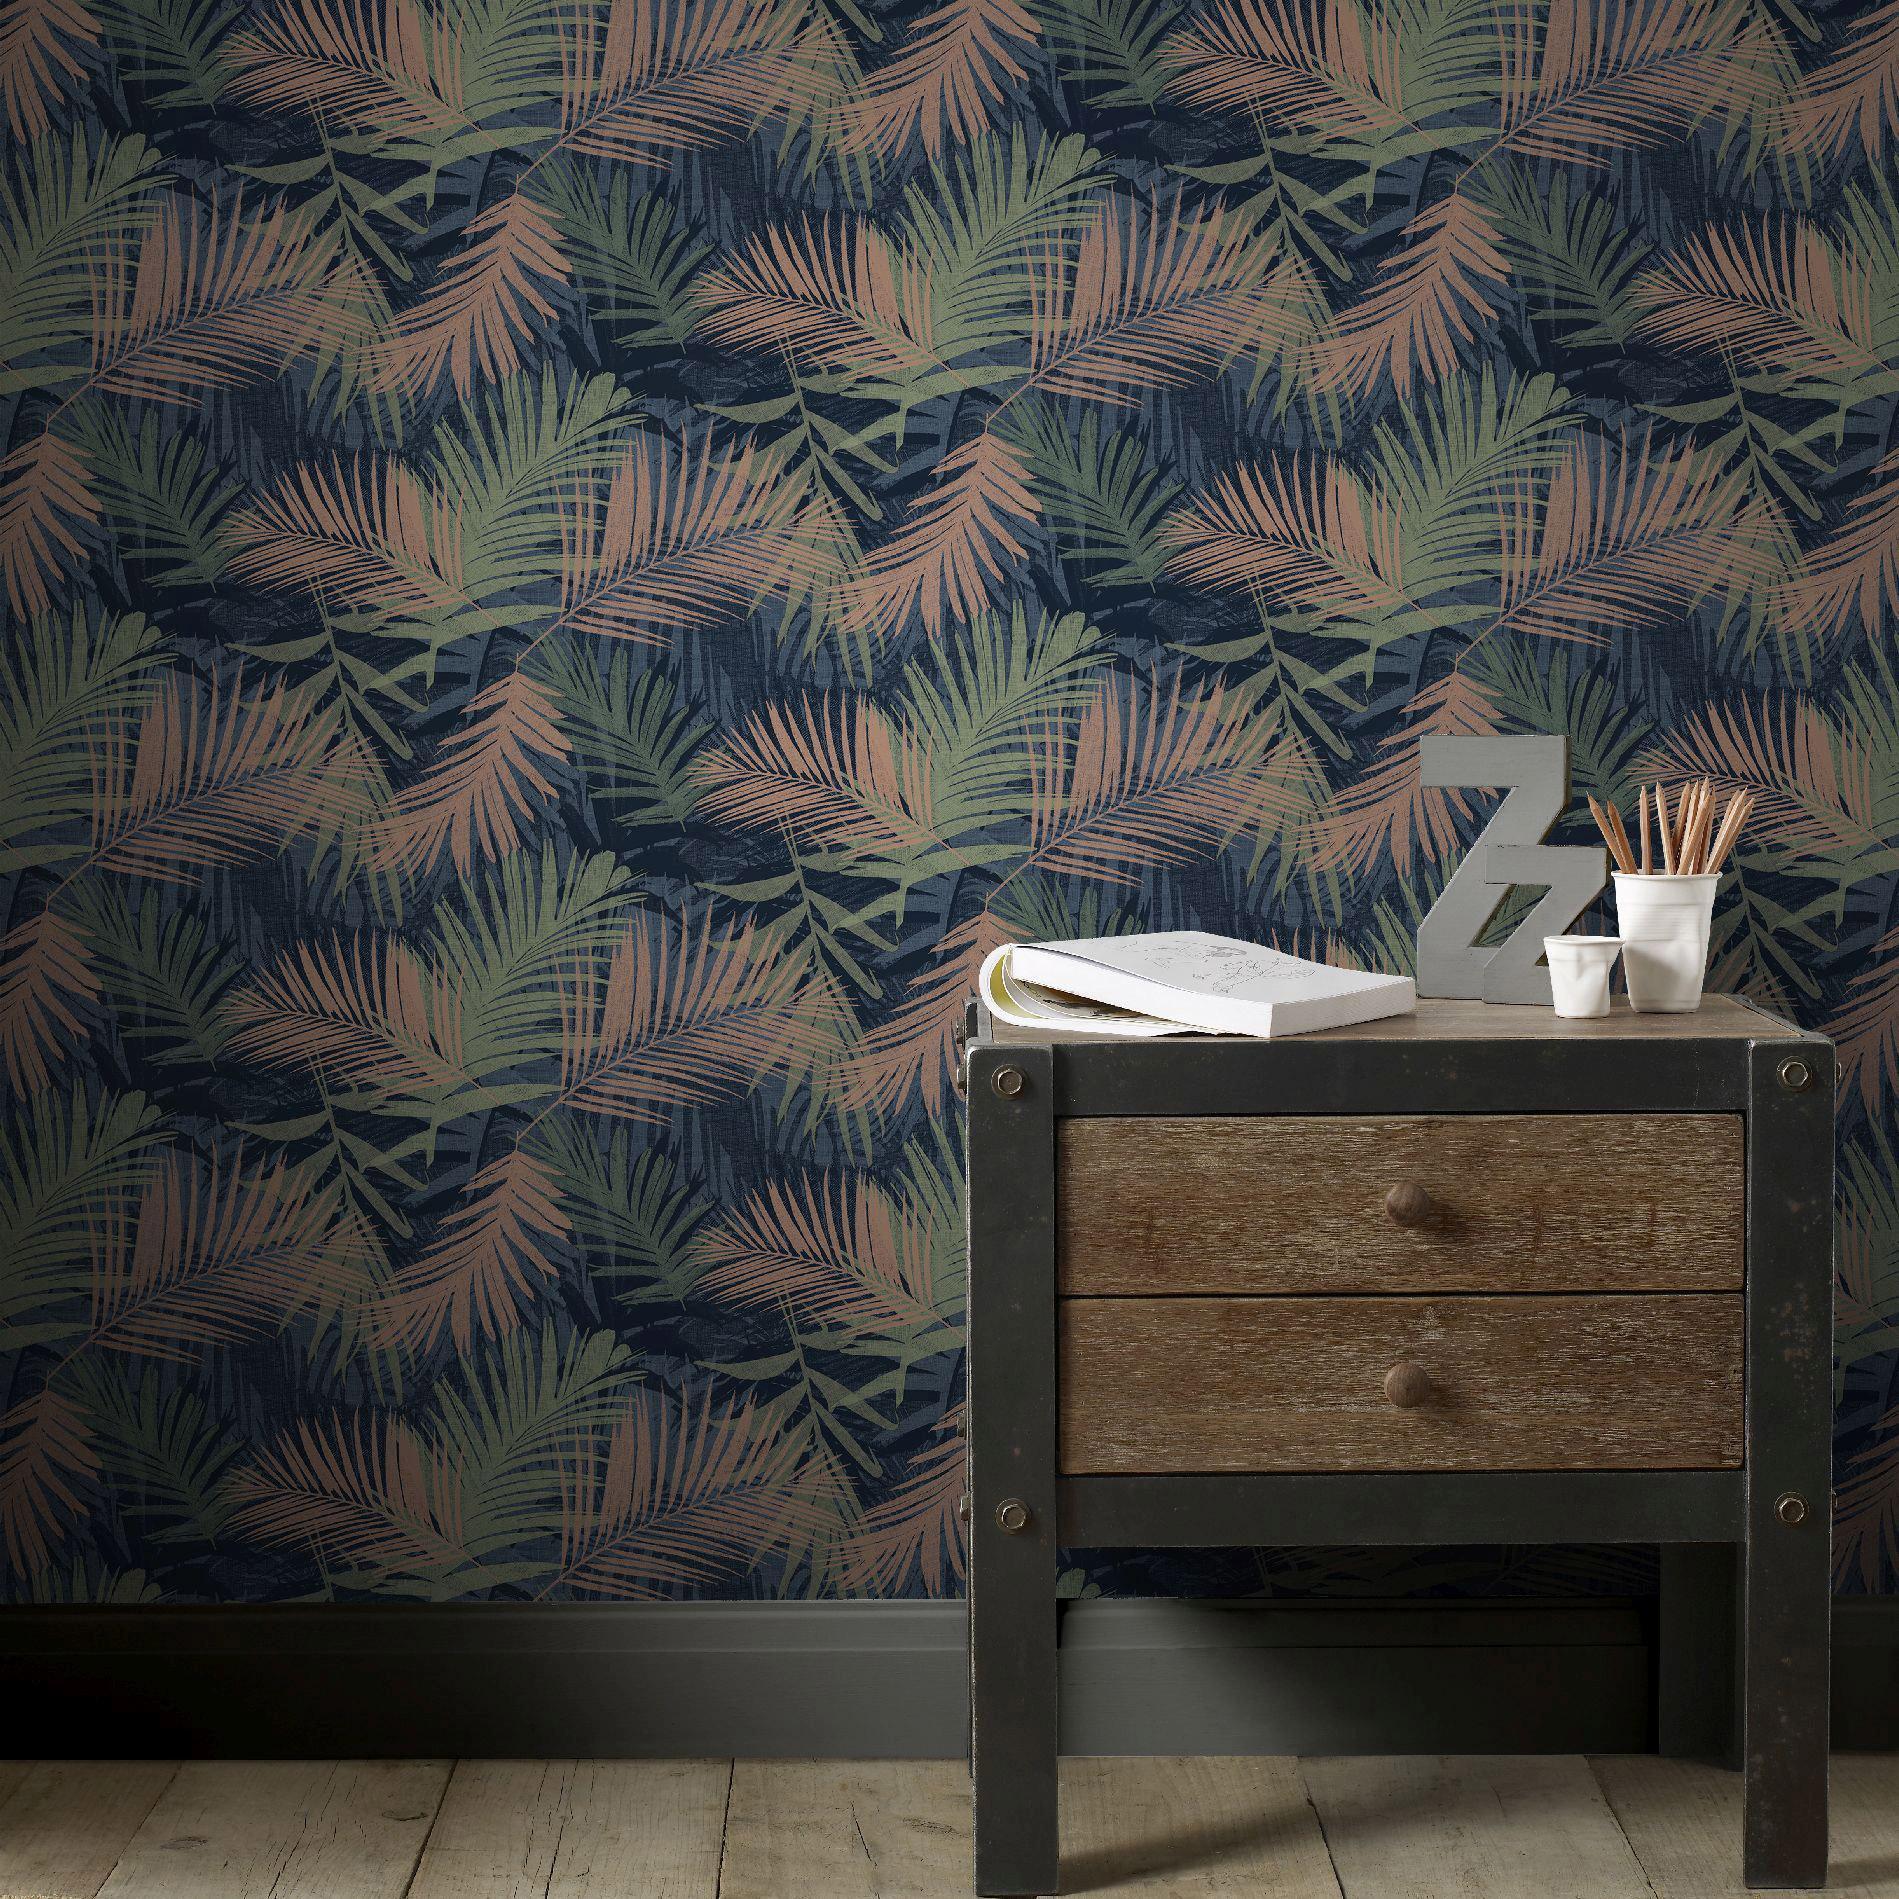 Papier peint vinyle Tropical Feuillage bleu/vert/noir